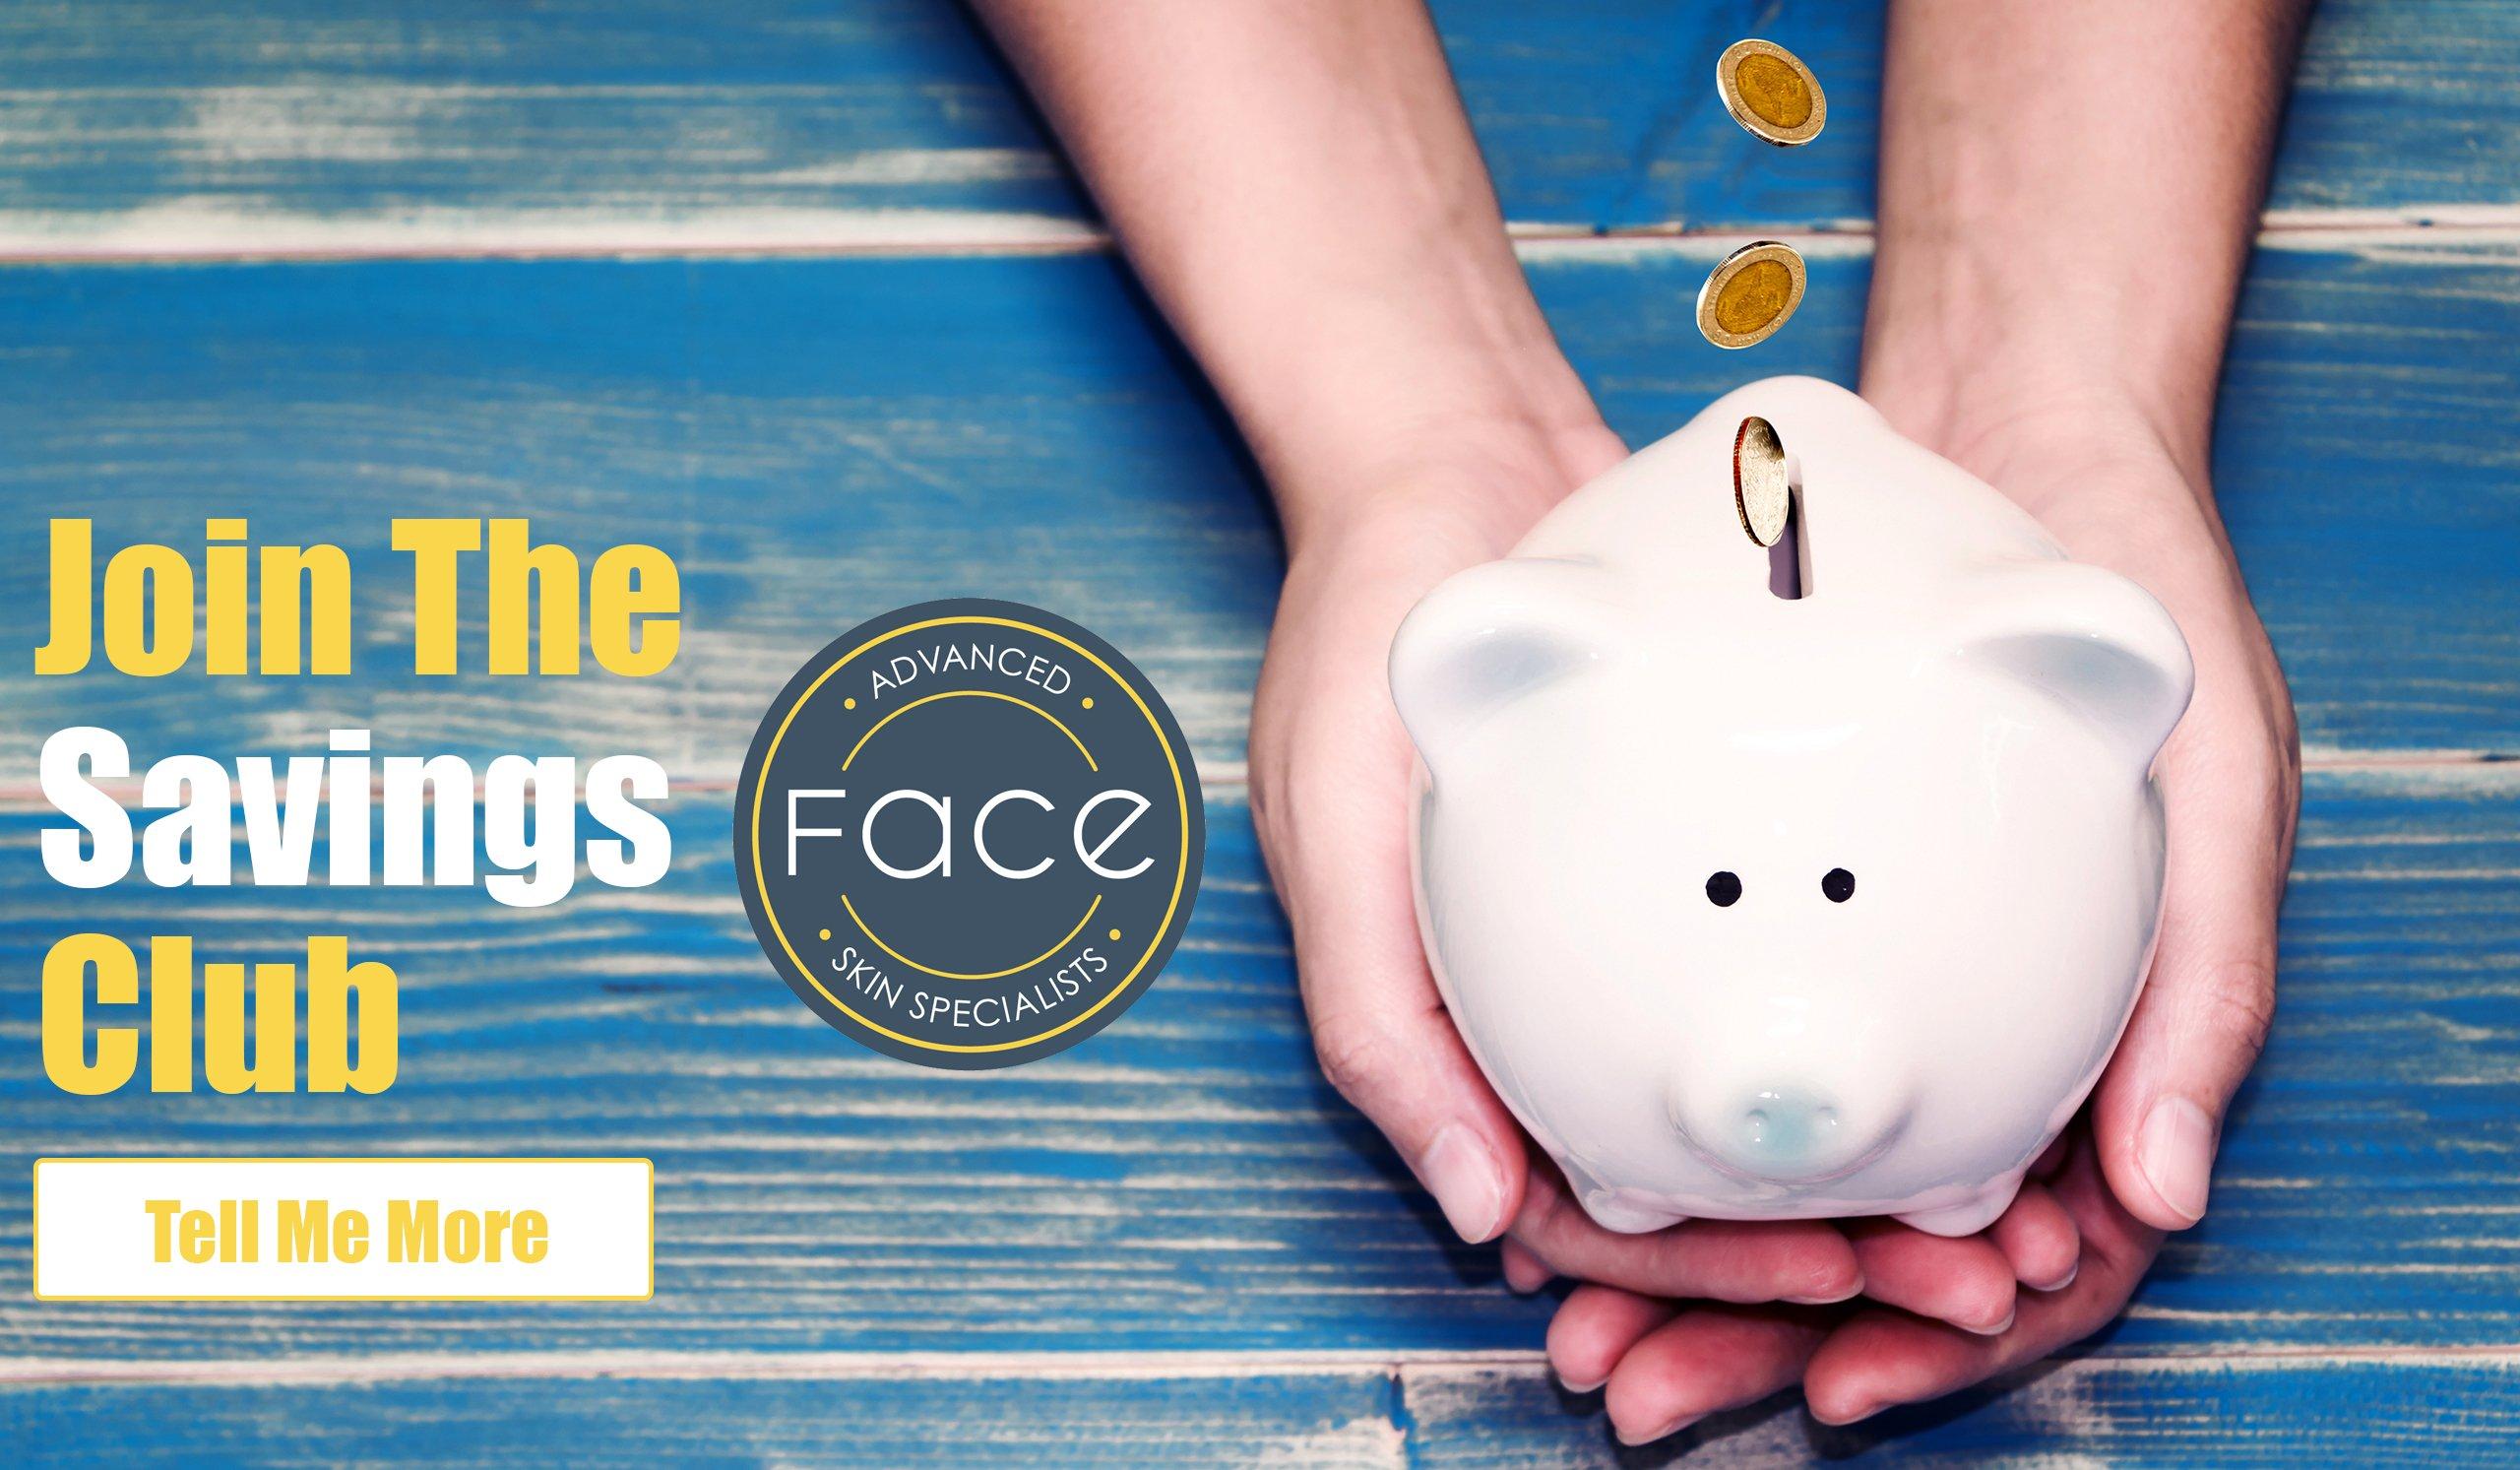 Face Savings Club - FACE